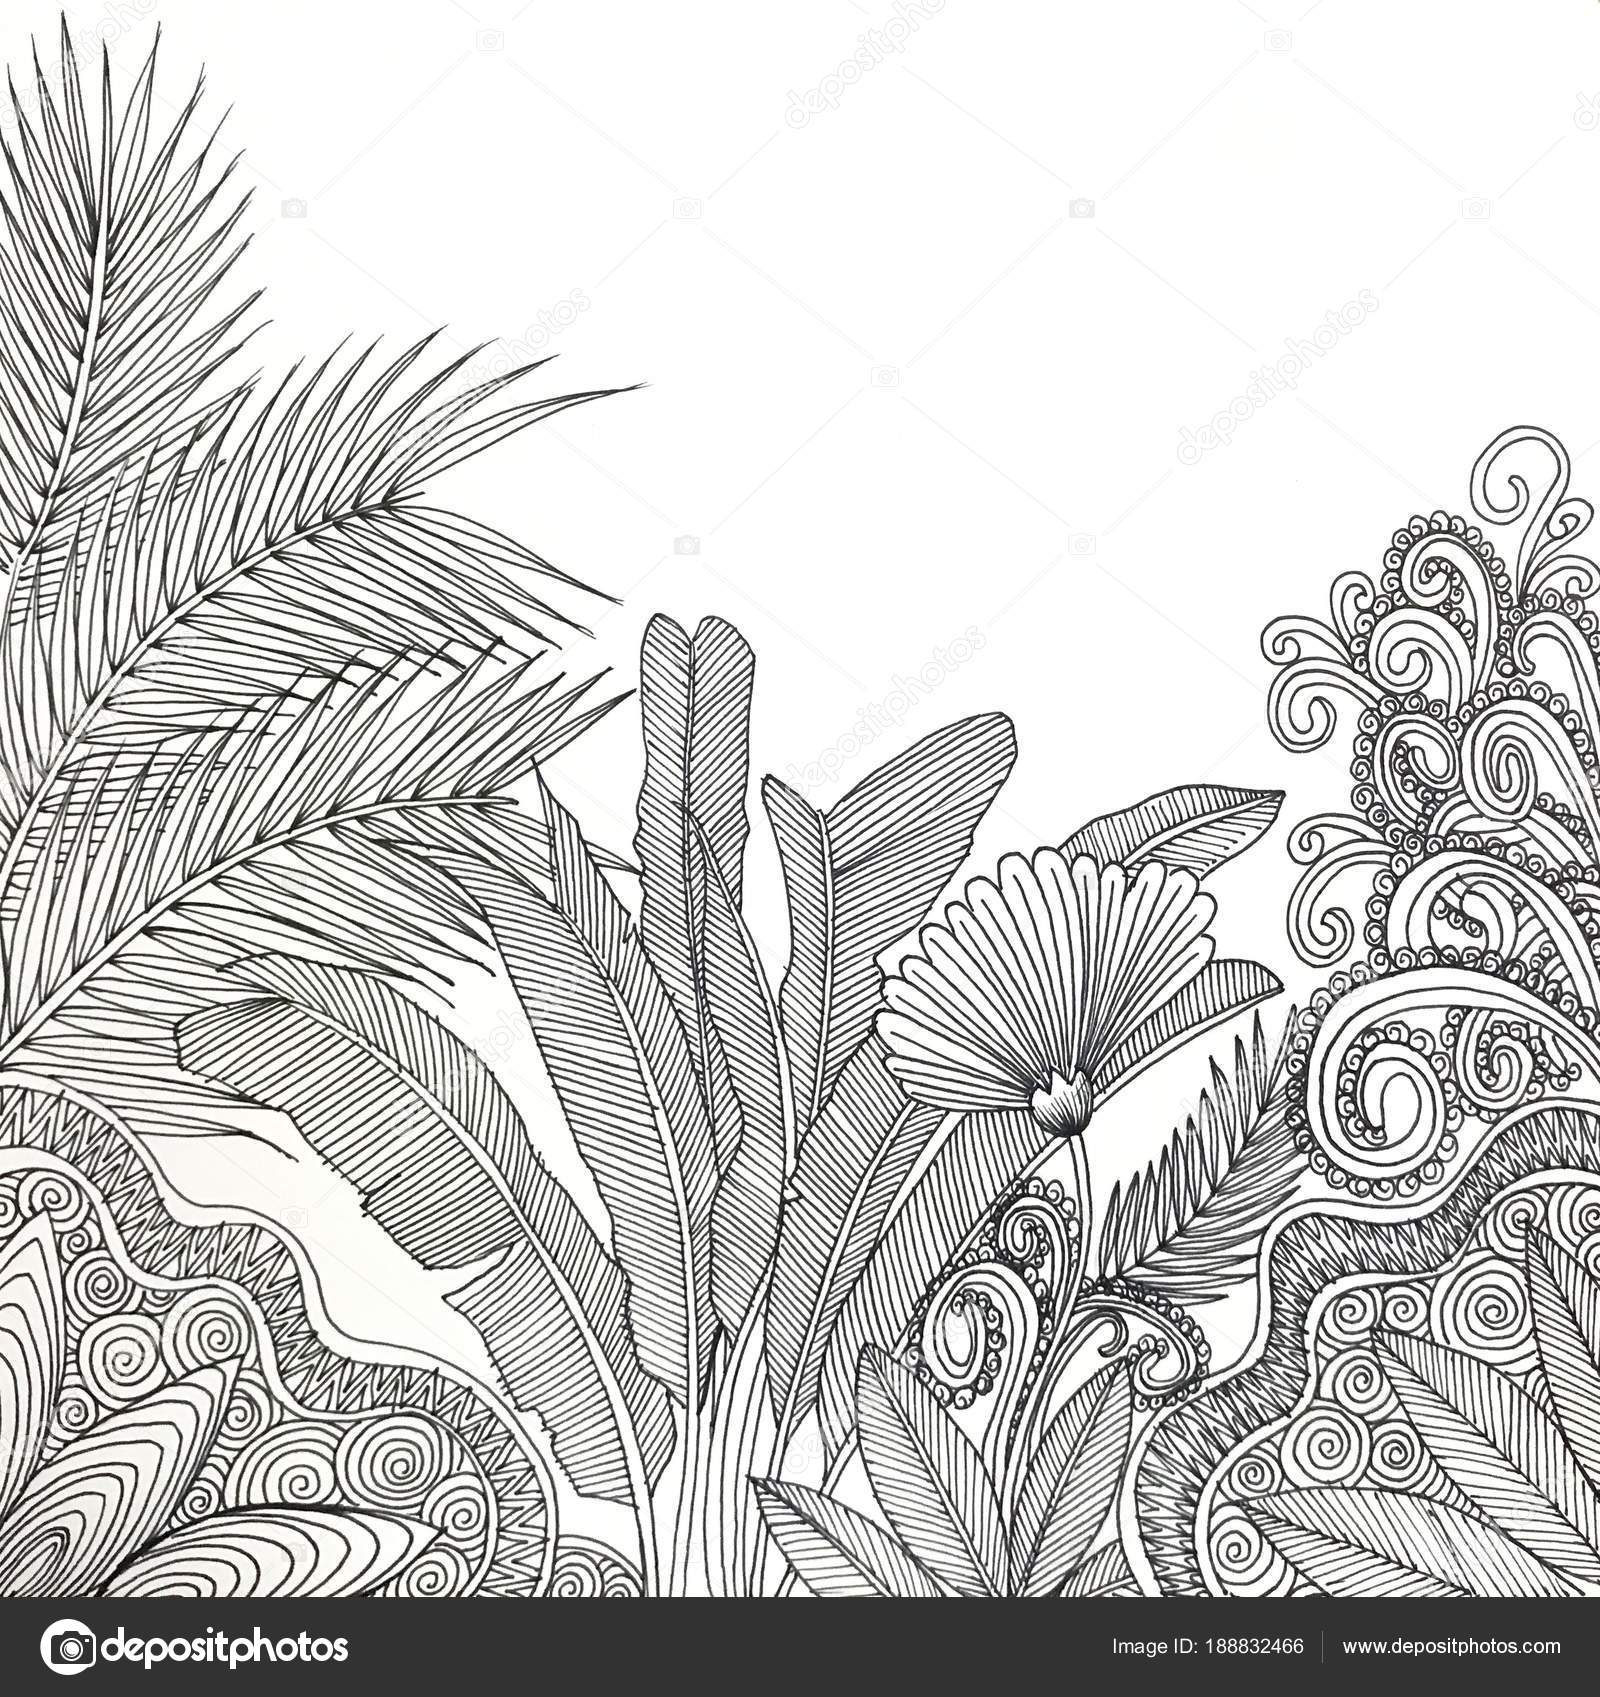 Divoka Zahrada Kresba Cernym Perem Stock Fotografie C Aekgasit